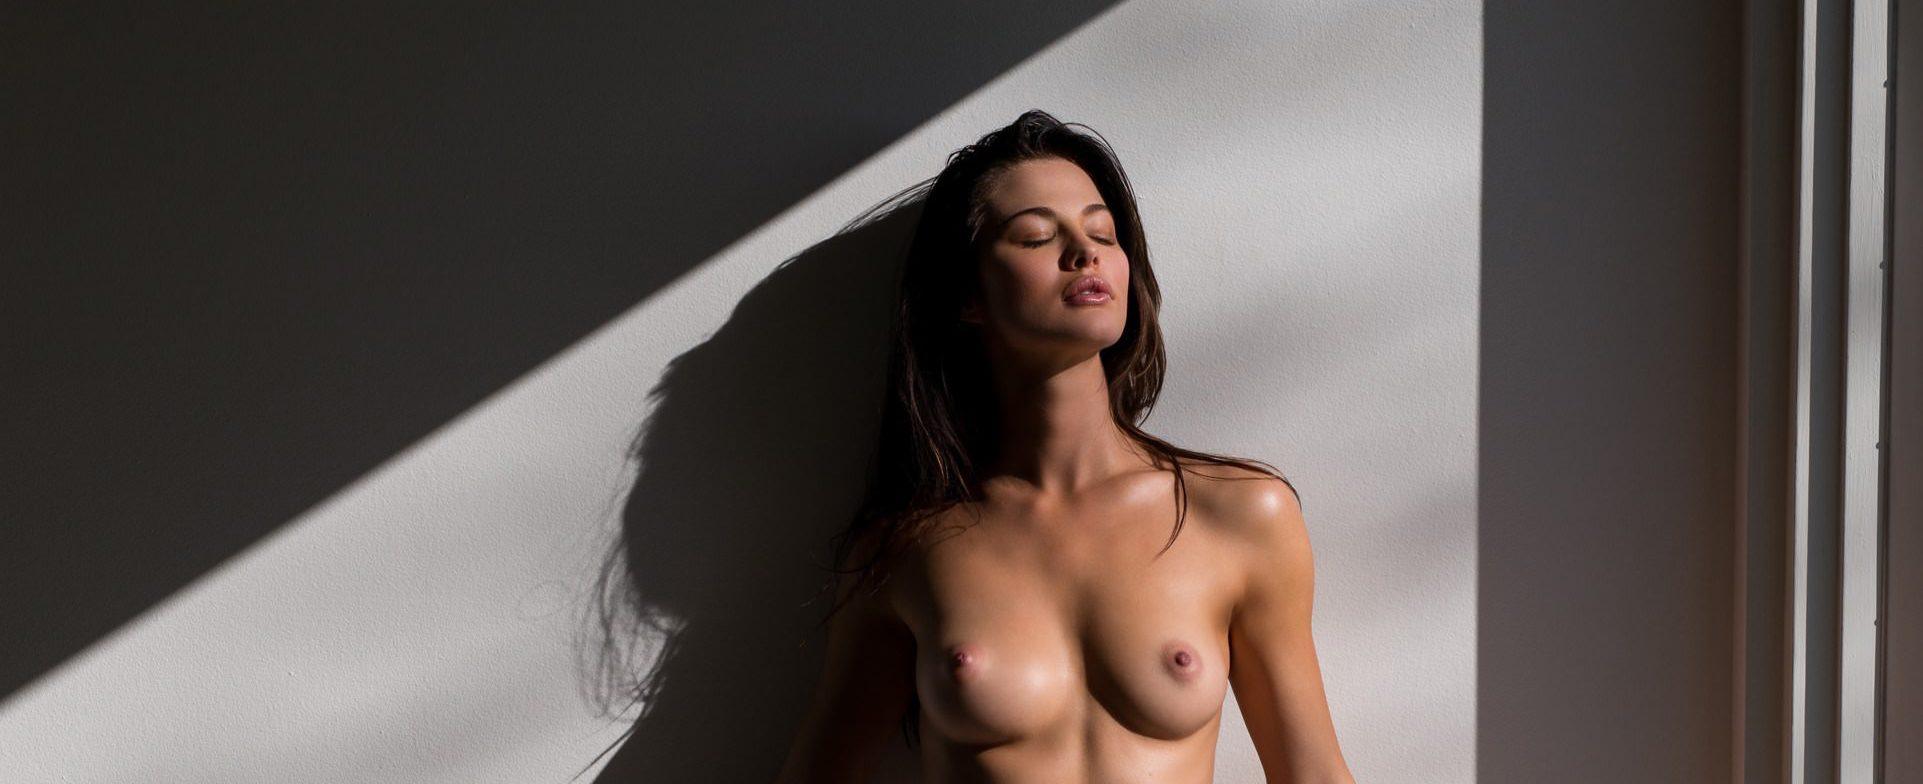 Playboy Jenny Watwood photo 25